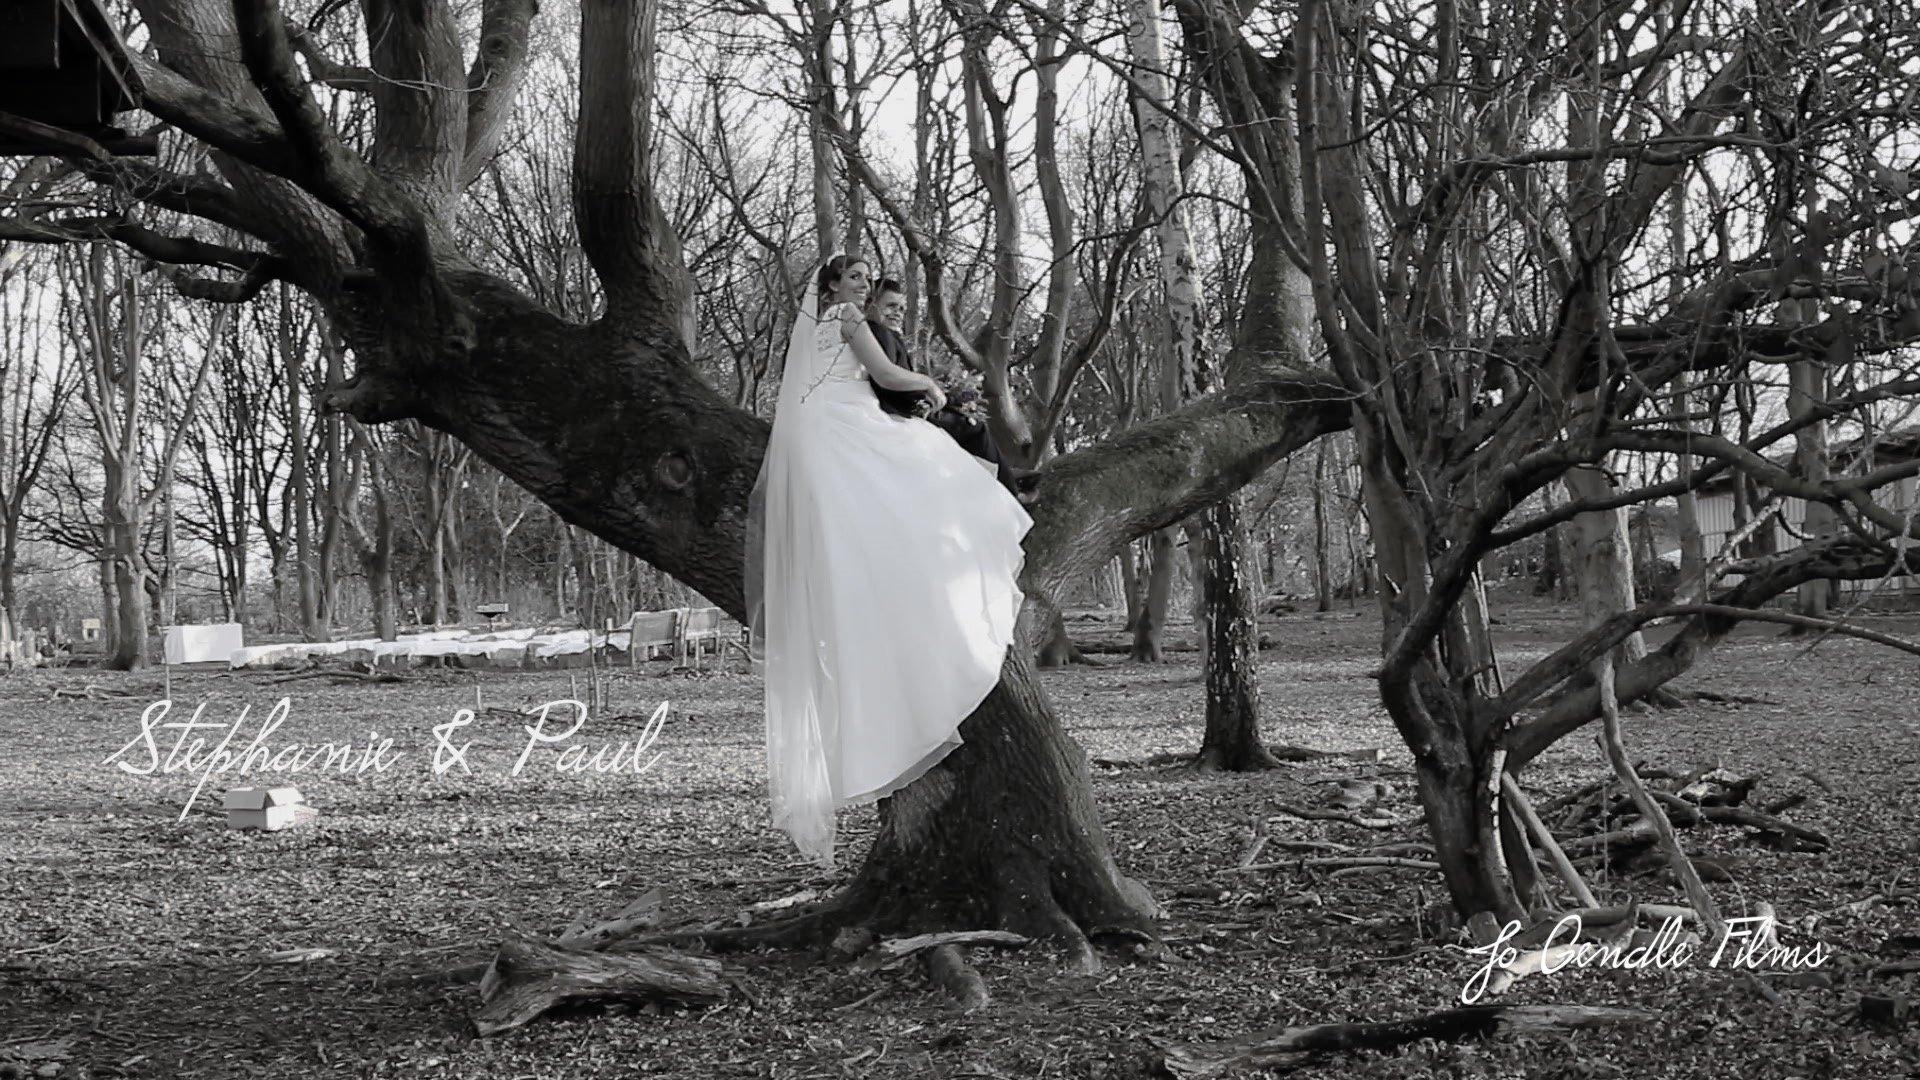 Trafford Hall tree and bride